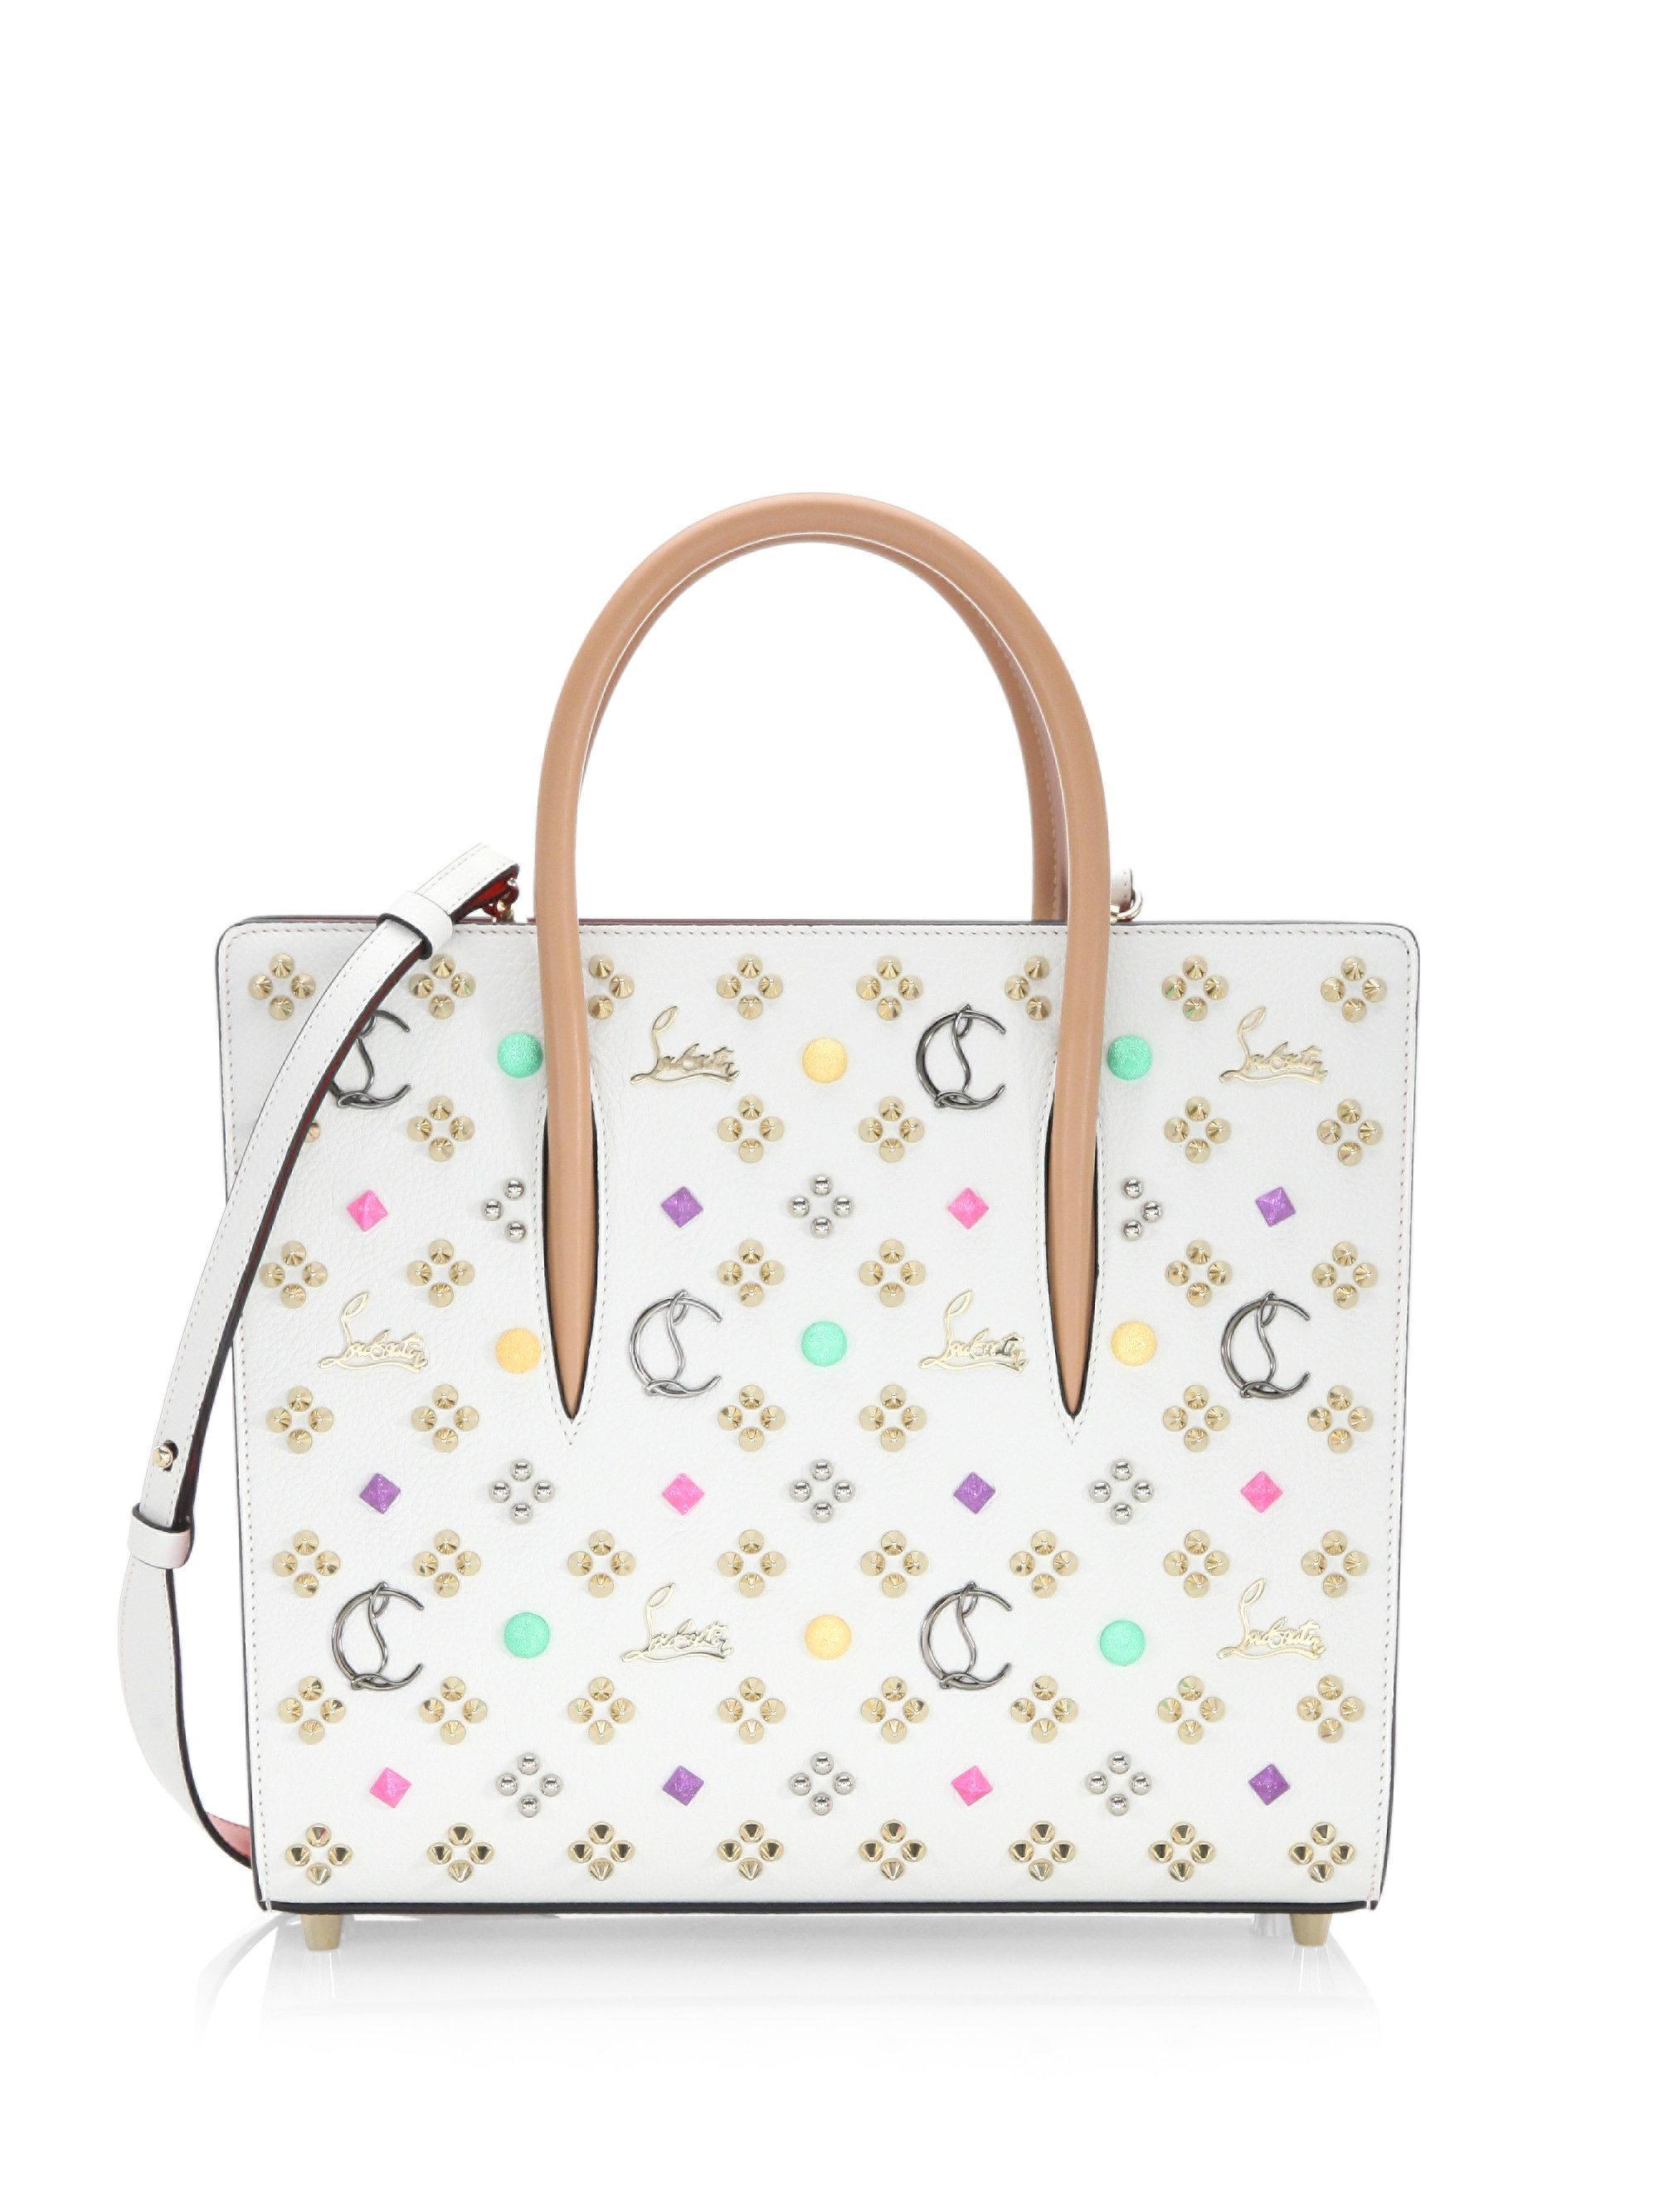 2c0eb10fd0c Christian Louboutin White Paloma Leather Top Handle Bag